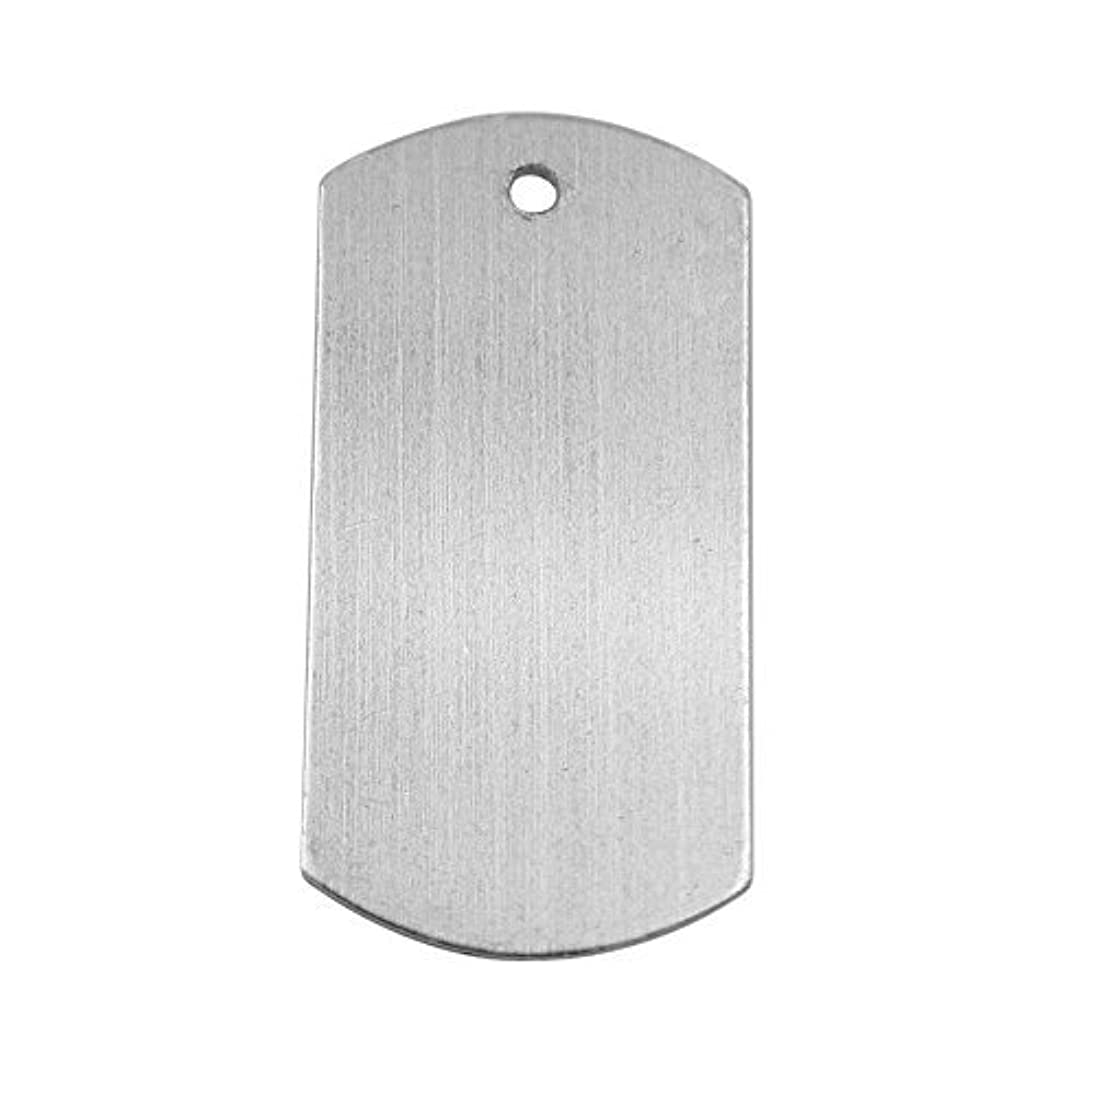 GazeKu Blank Stamping Tags, W/Hole, Aluminum .063 Inch (14 Ga.) (1X2 Inch Vertical Line 25)